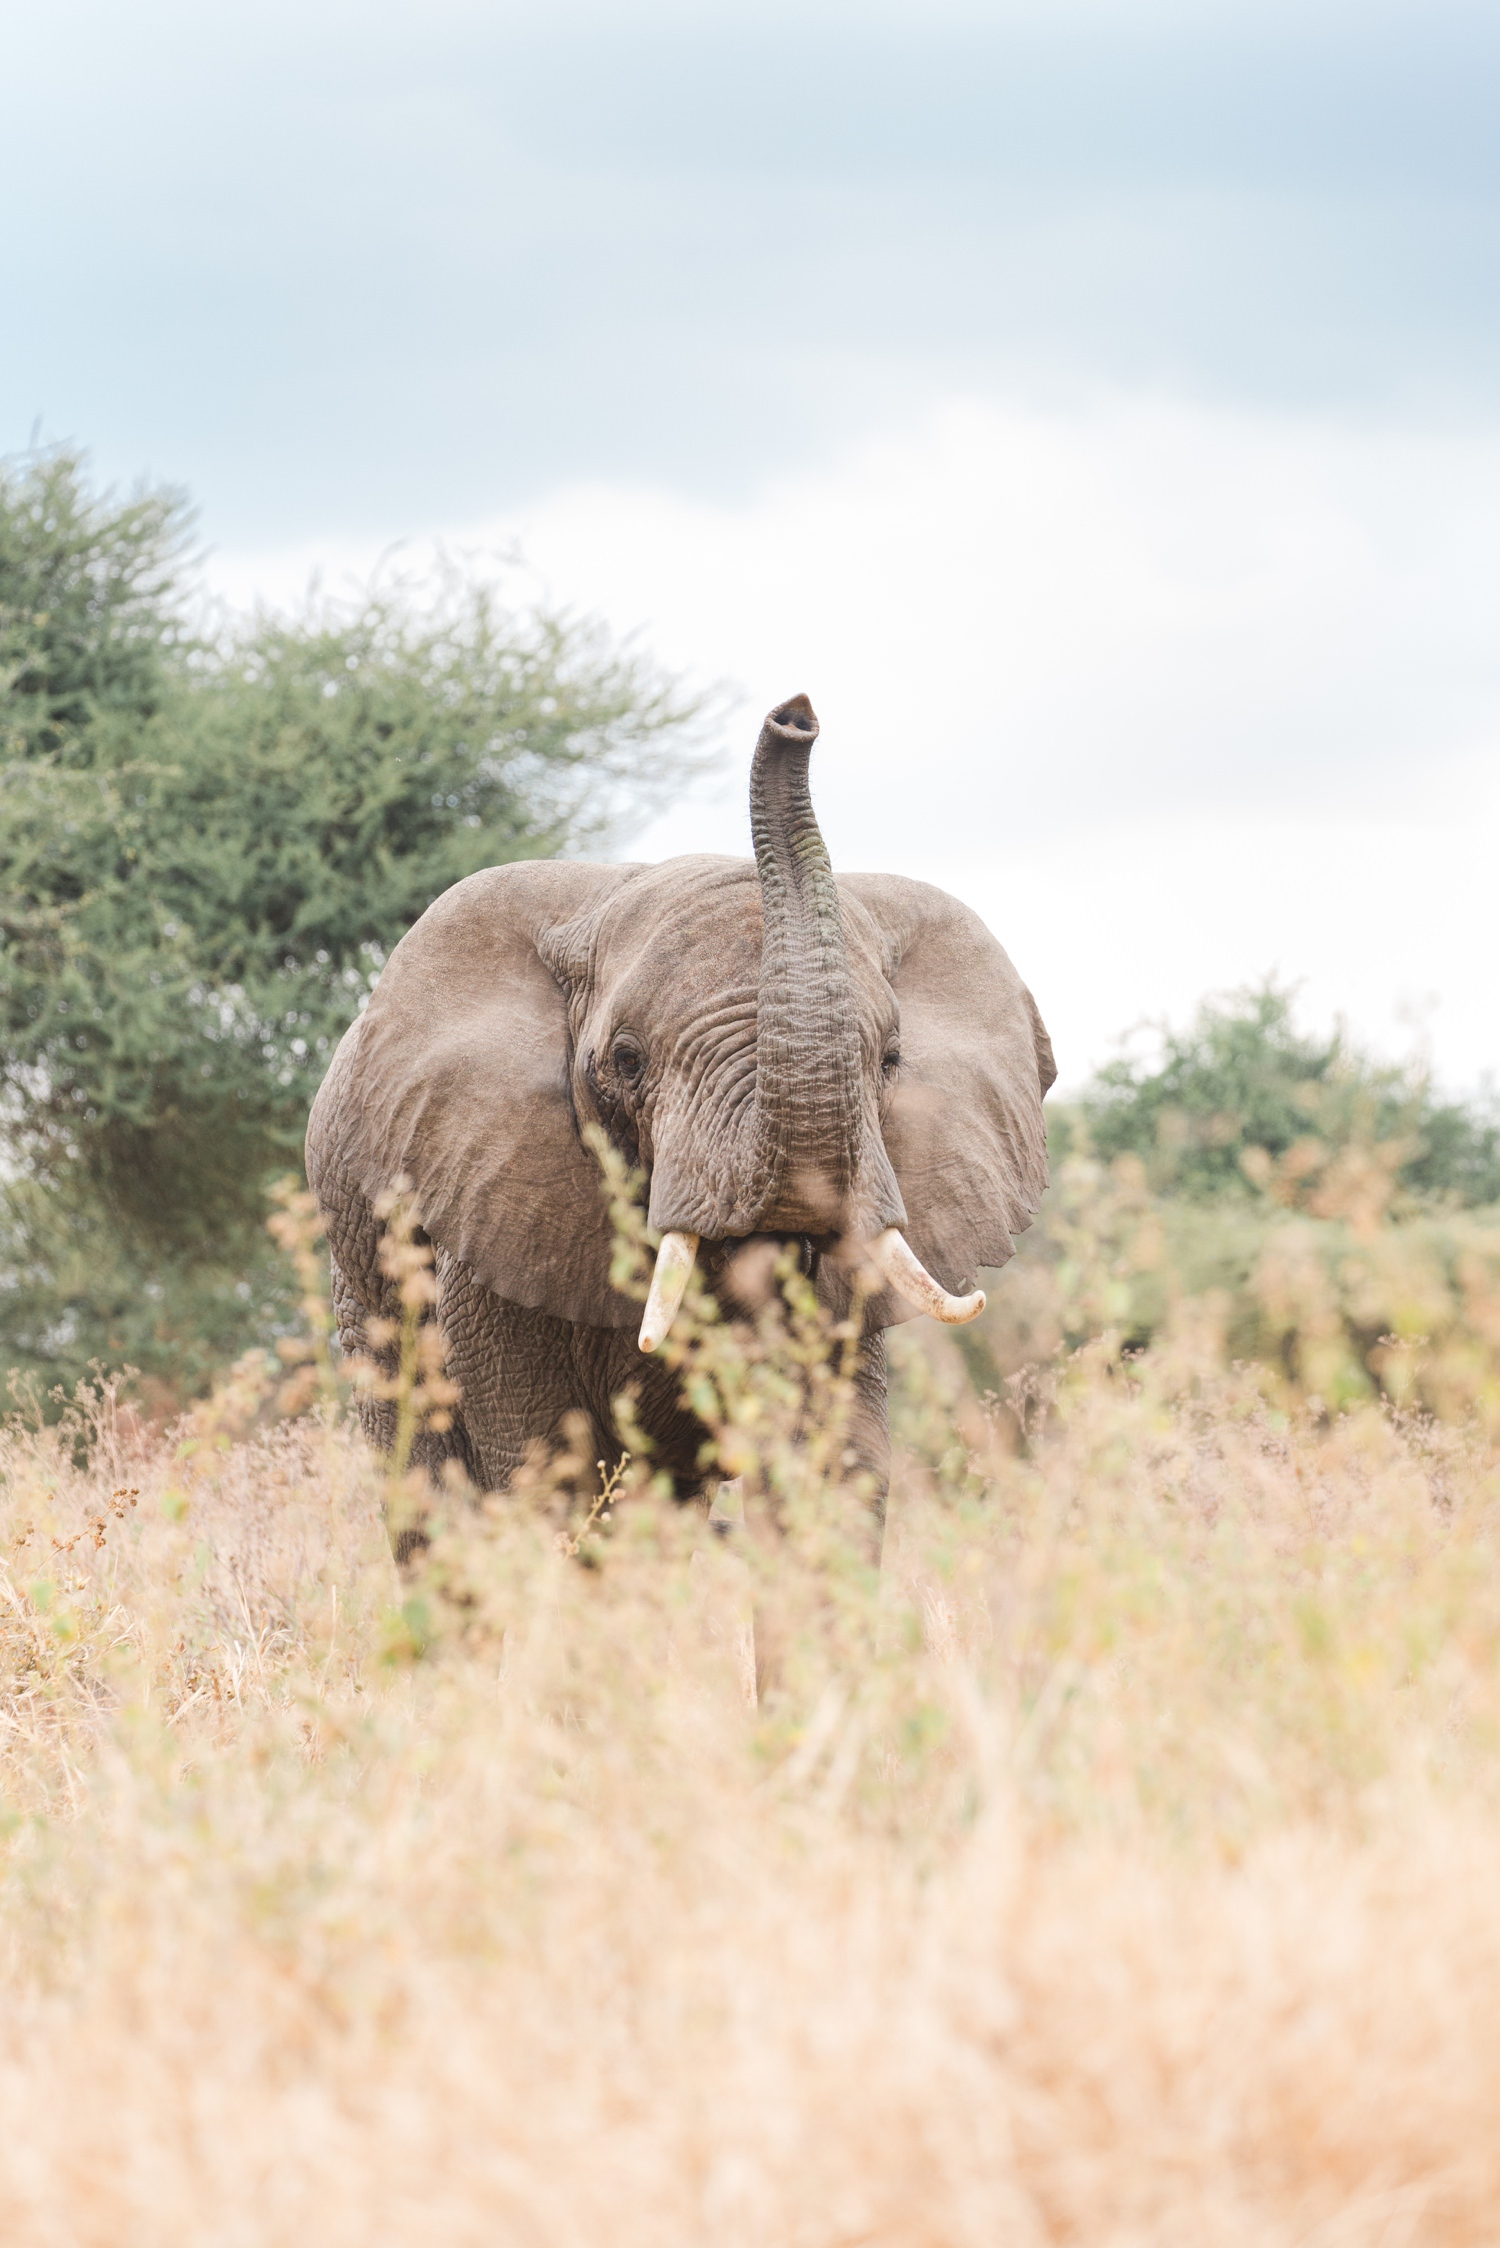 cameron-zegers-photography-tanzania.jpg